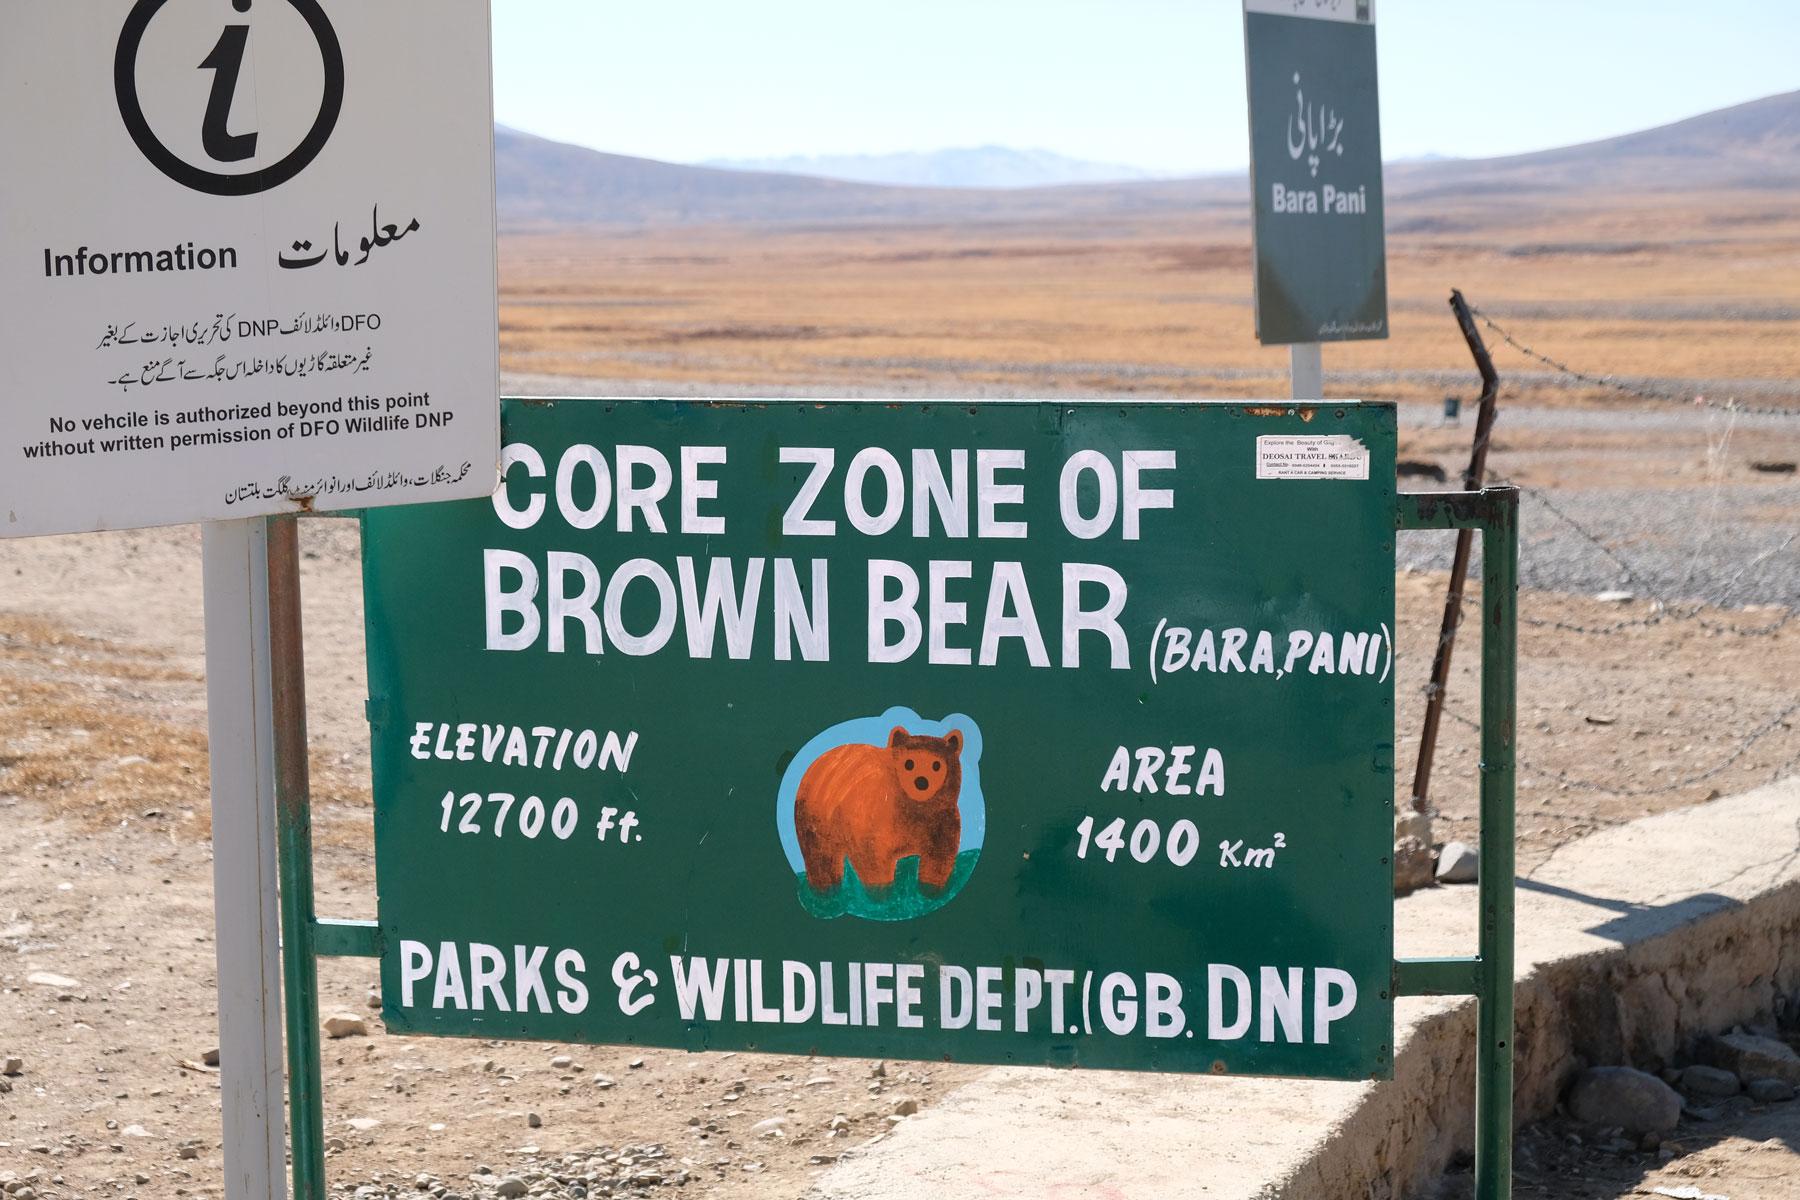 Hinweisschild in den Deosai Plains, das vor Braunbären warnt.